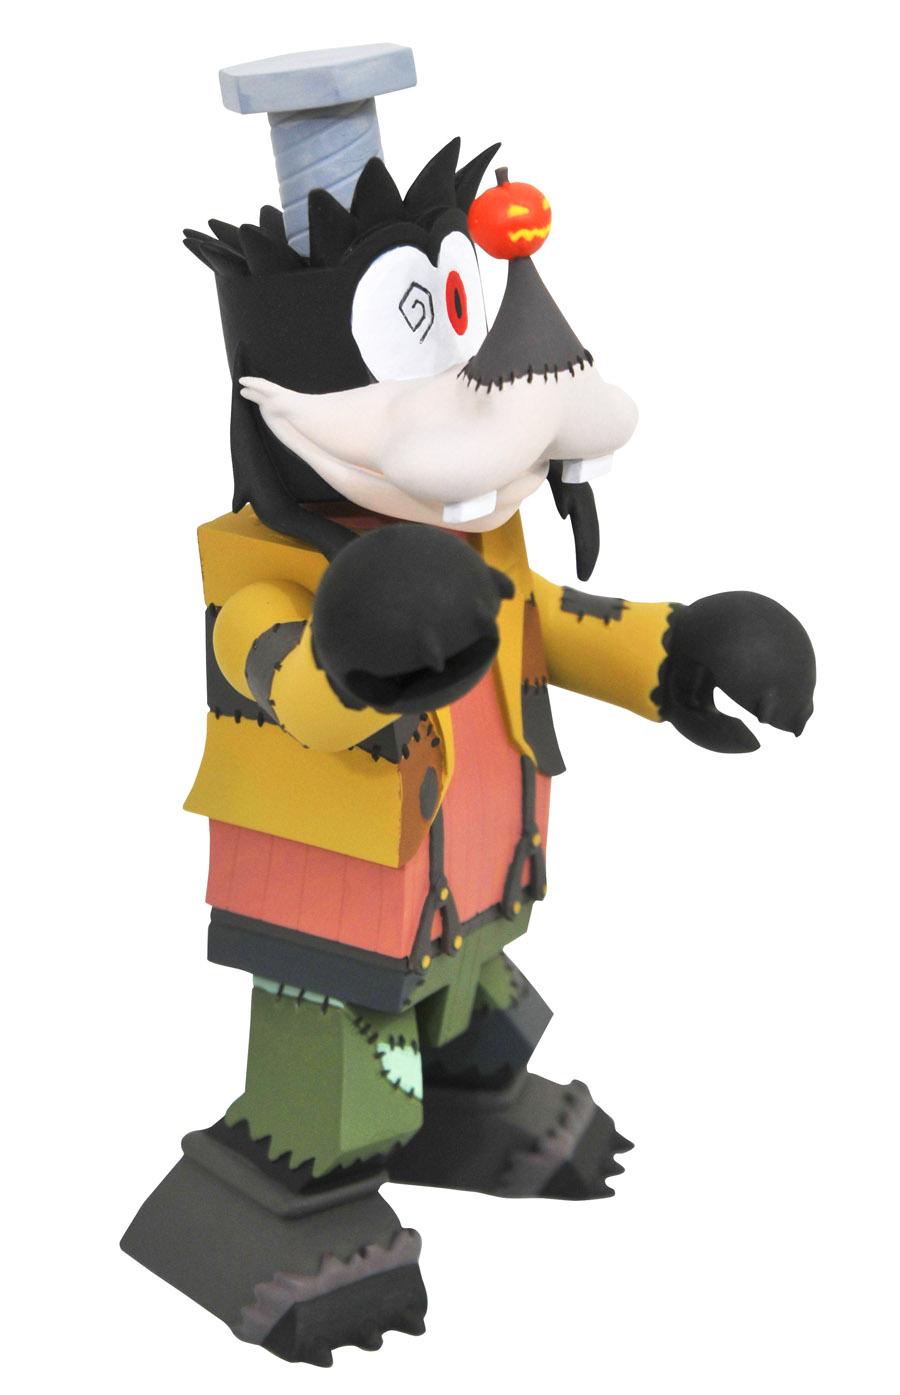 Halloween Town Goofy Kingdom Hearts Vinimate Vinyl Figure